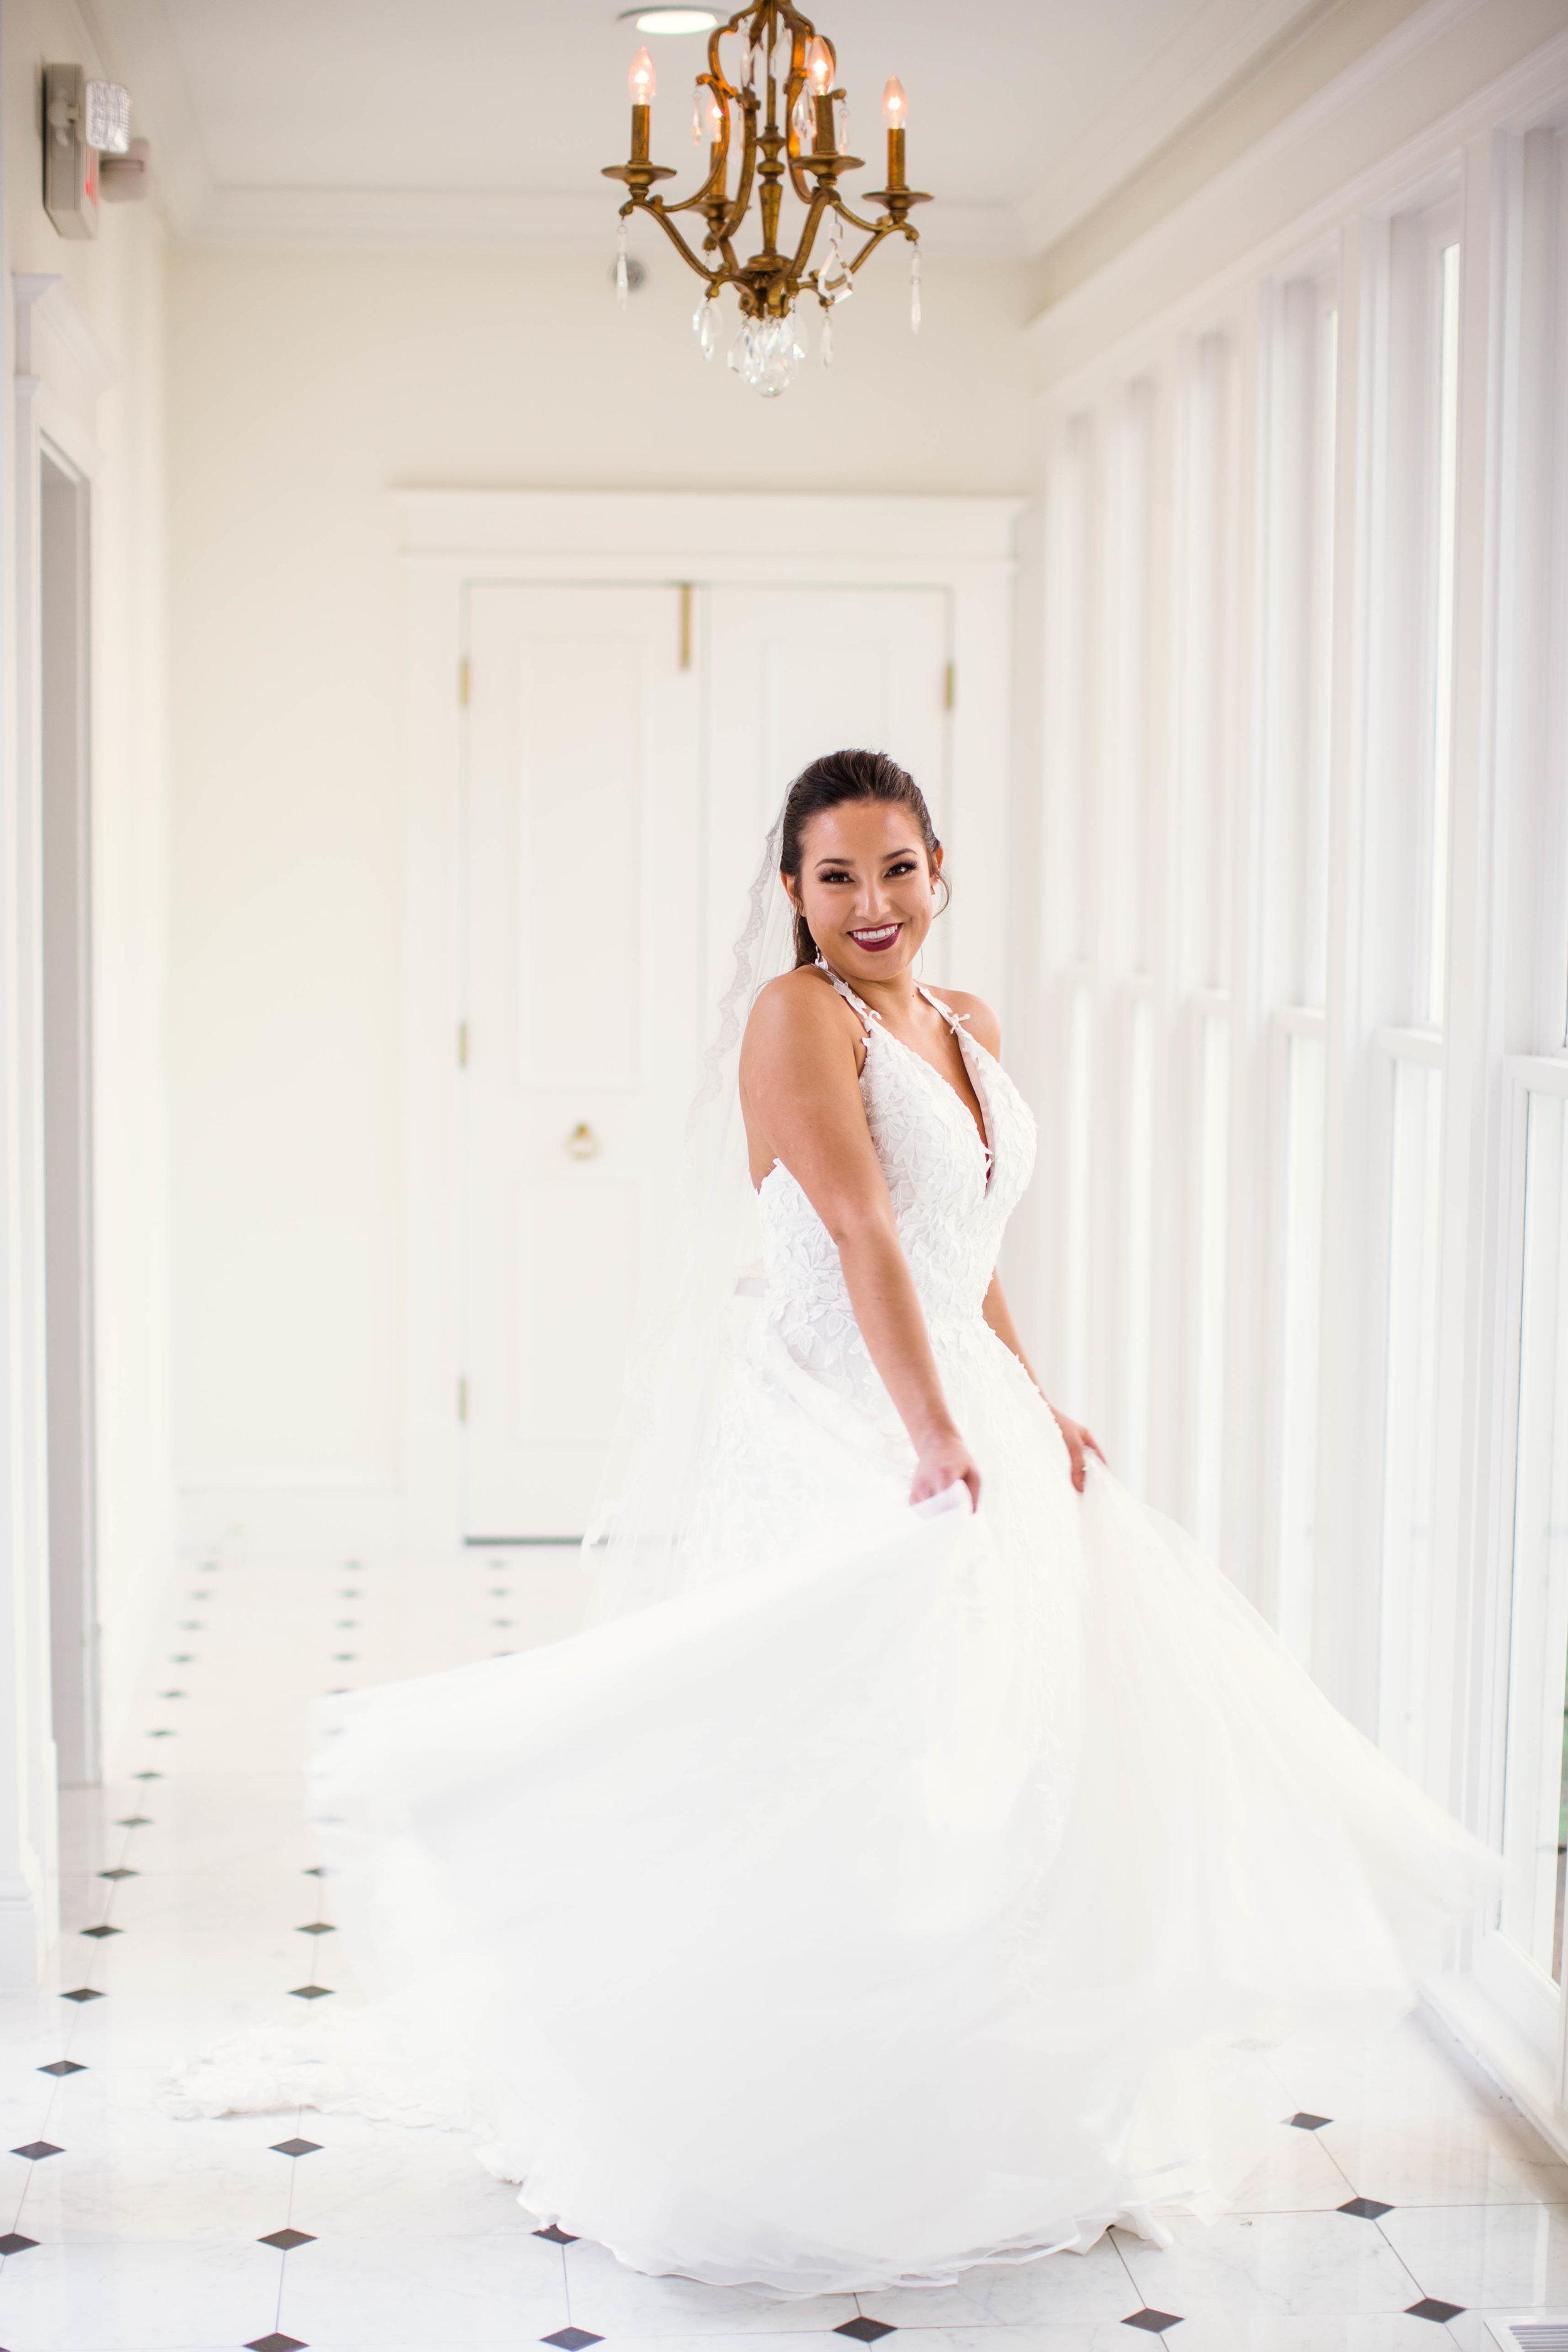 What Dress Should I choose? Oahu Hawaii Wedding Photographer